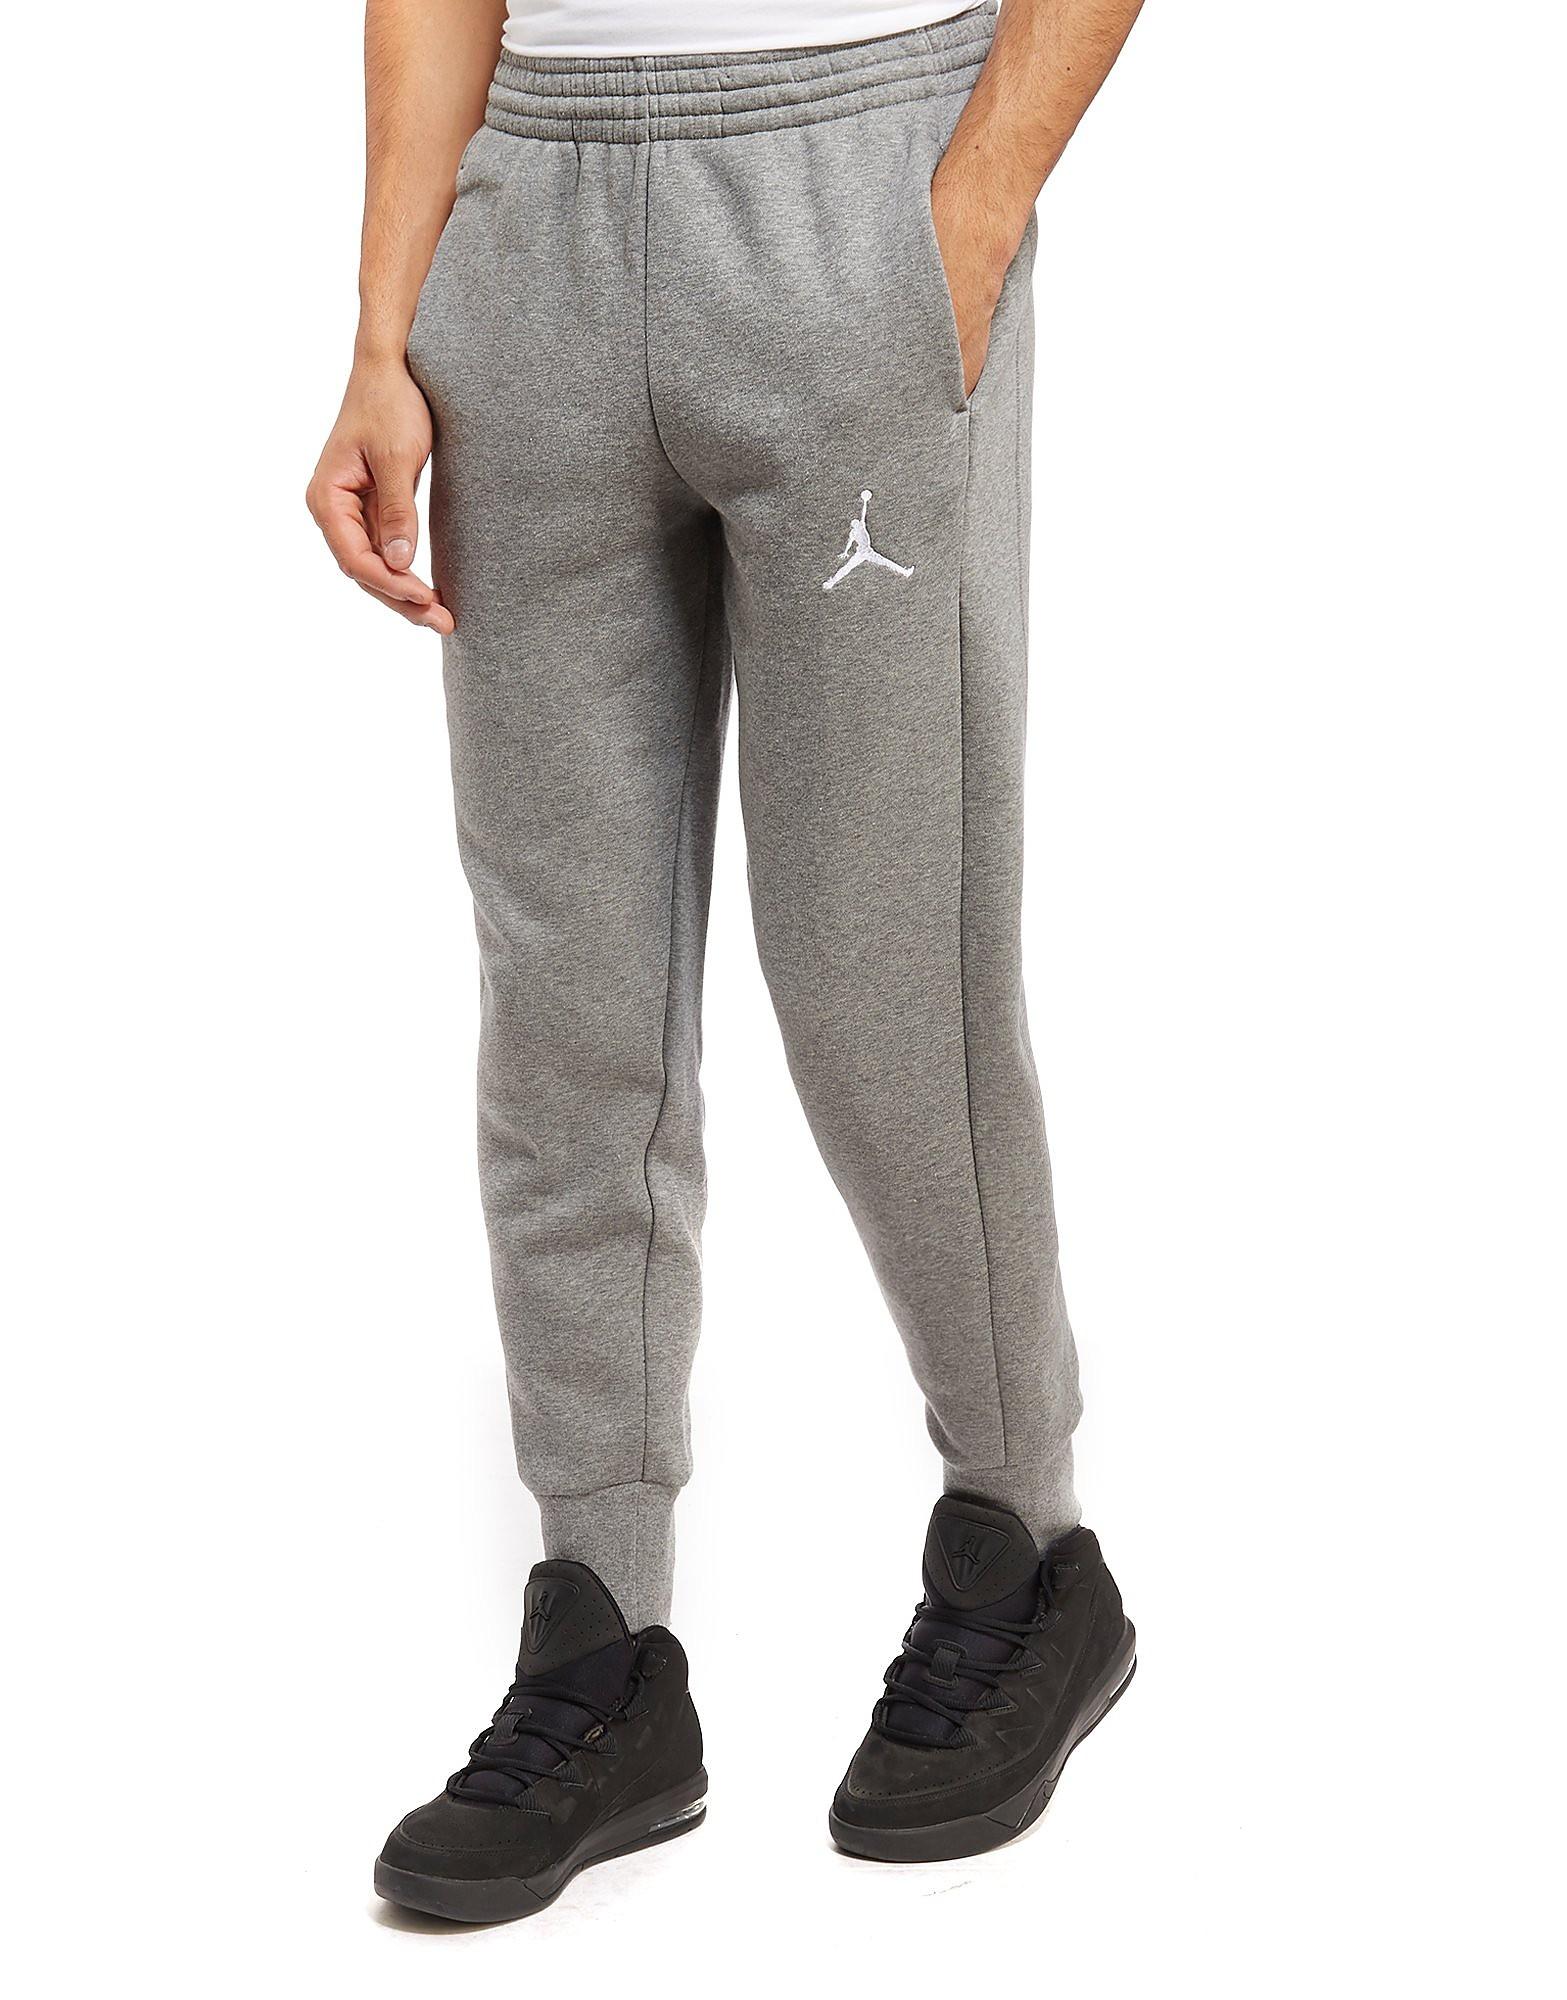 Jordan Legend Flight Pants